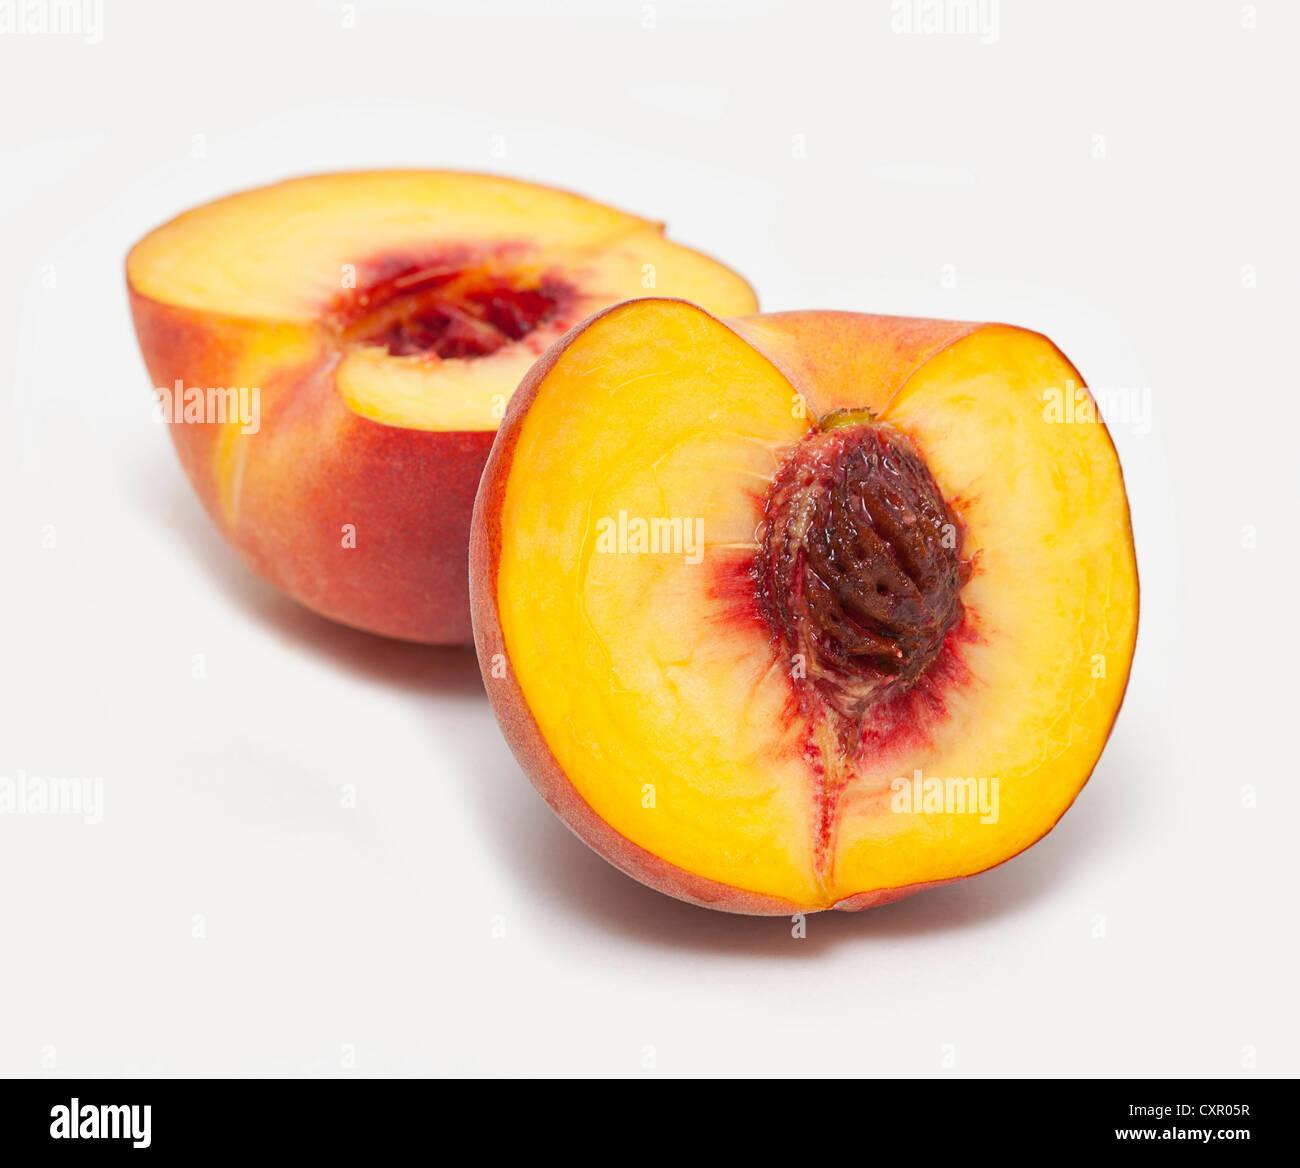 Peach cut in half - Stock Image